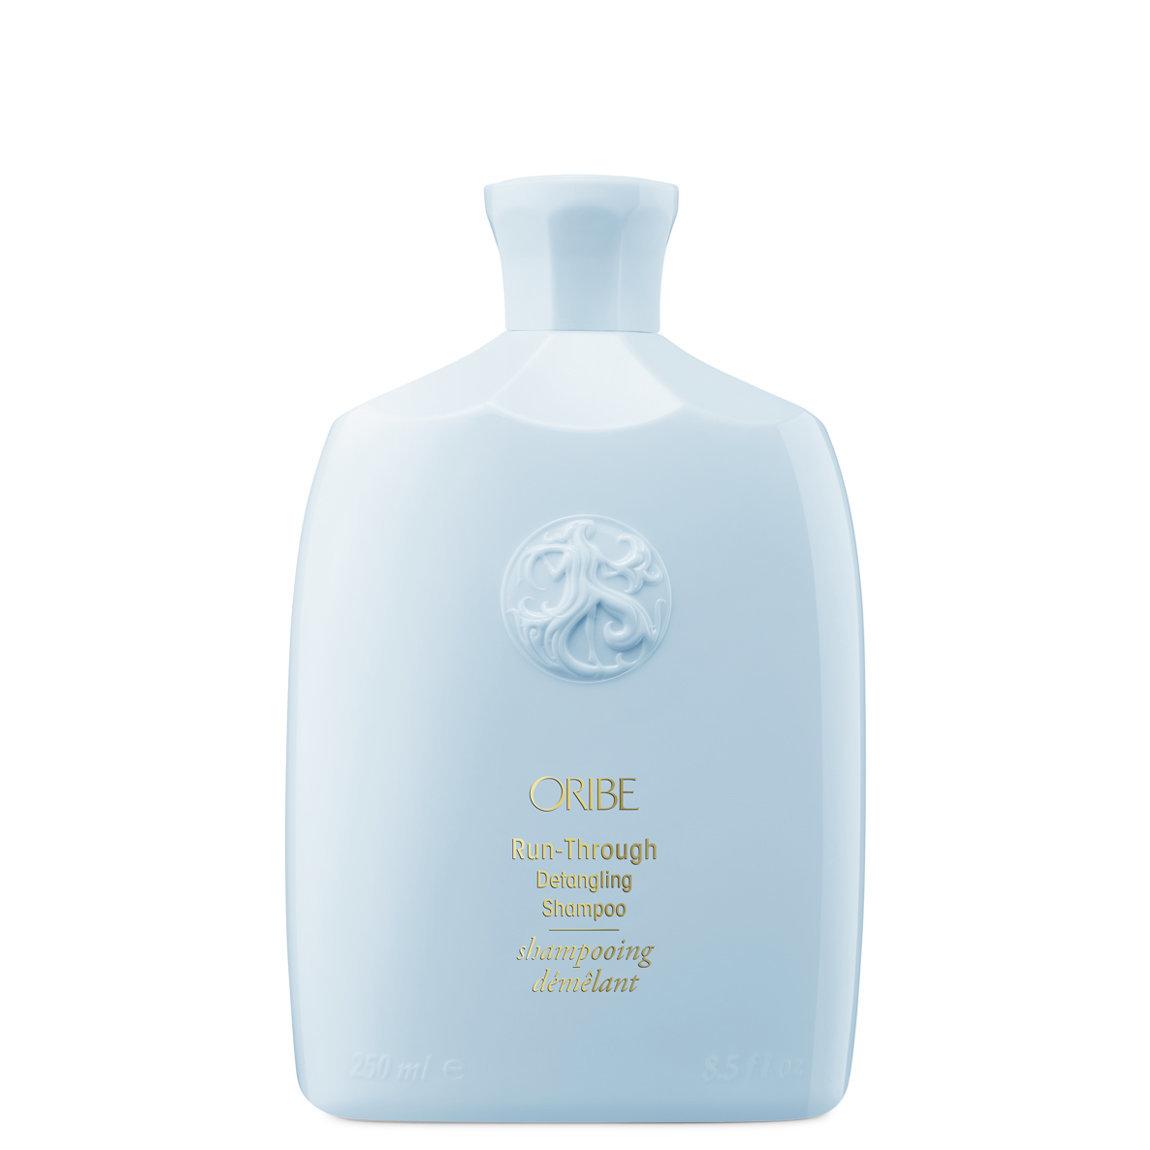 Oribe Run-Through Detangling Shampoo alternative view 1 - product swatch.